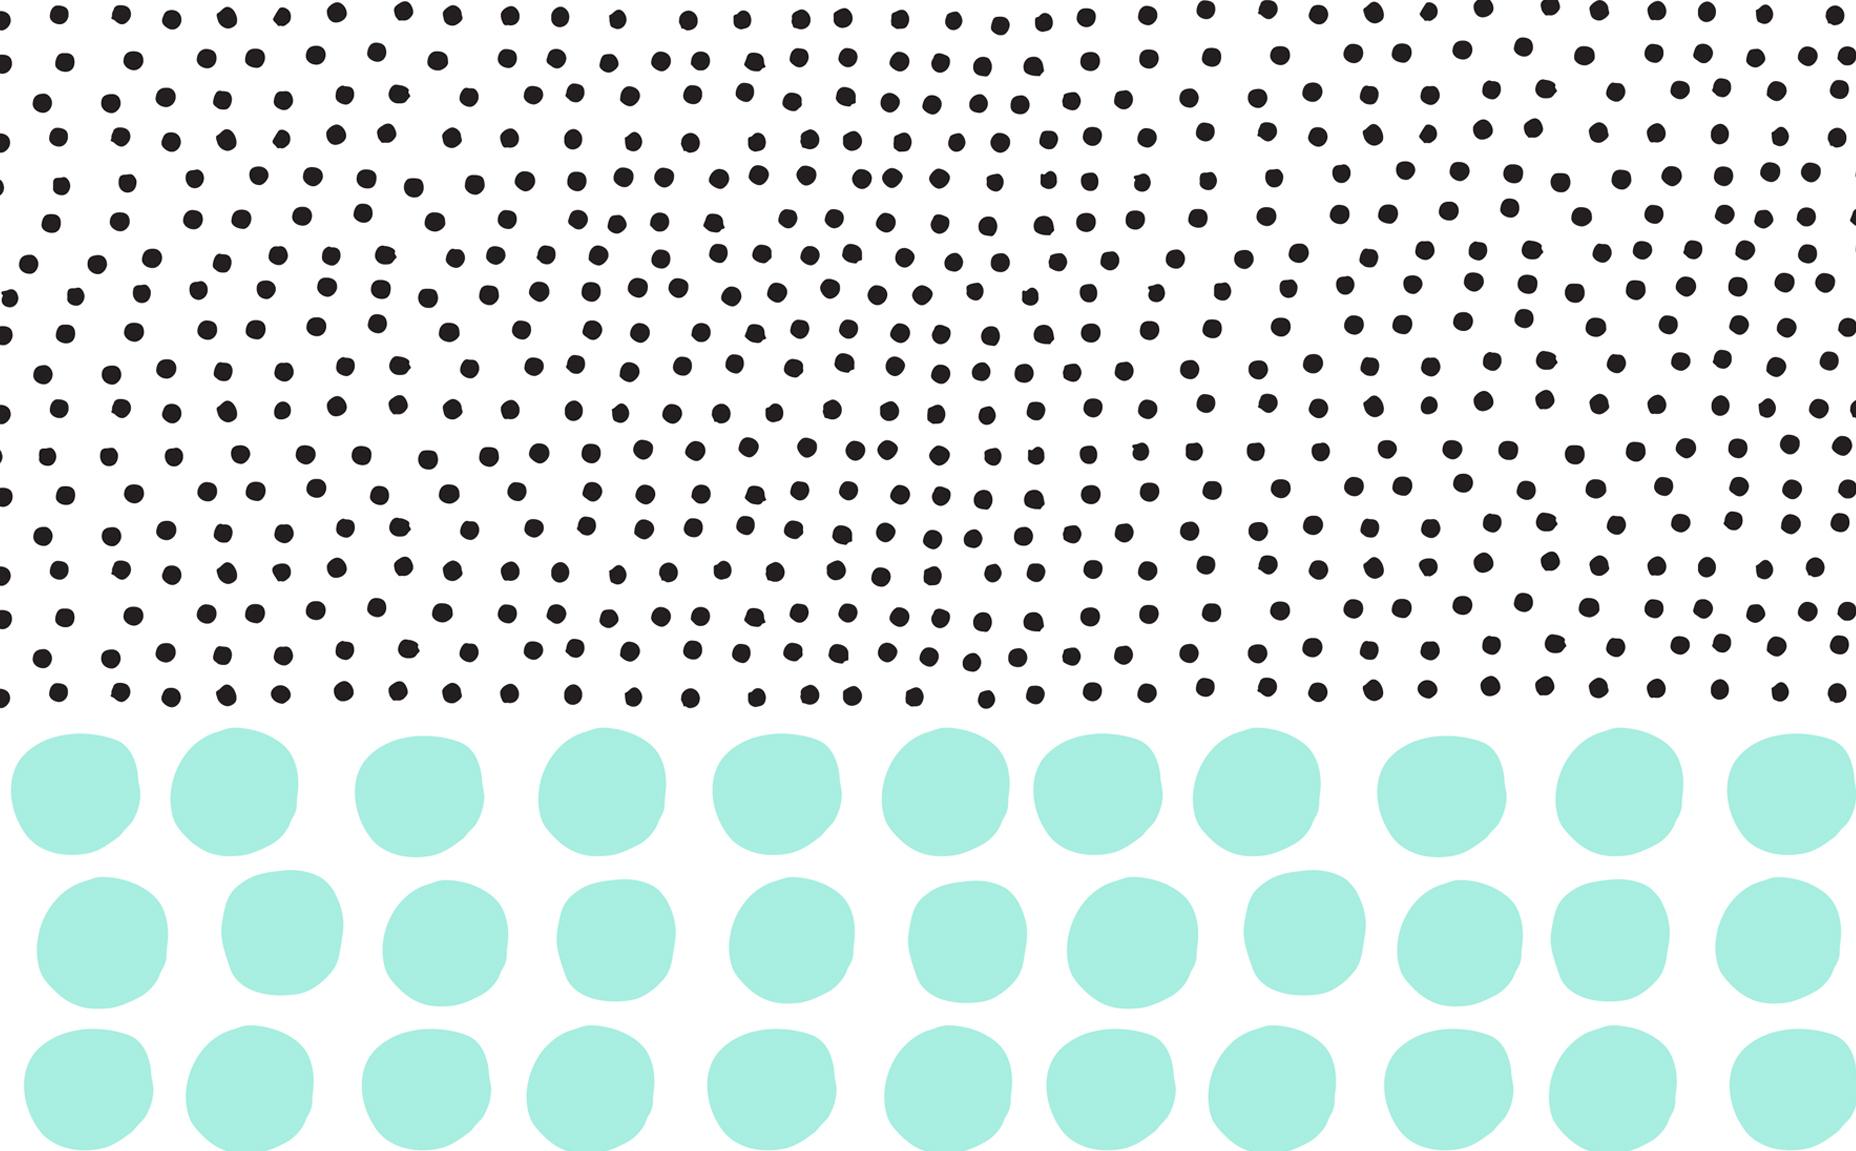 July 2015 wallpaper downloads may designs for Wallpaper pattern design